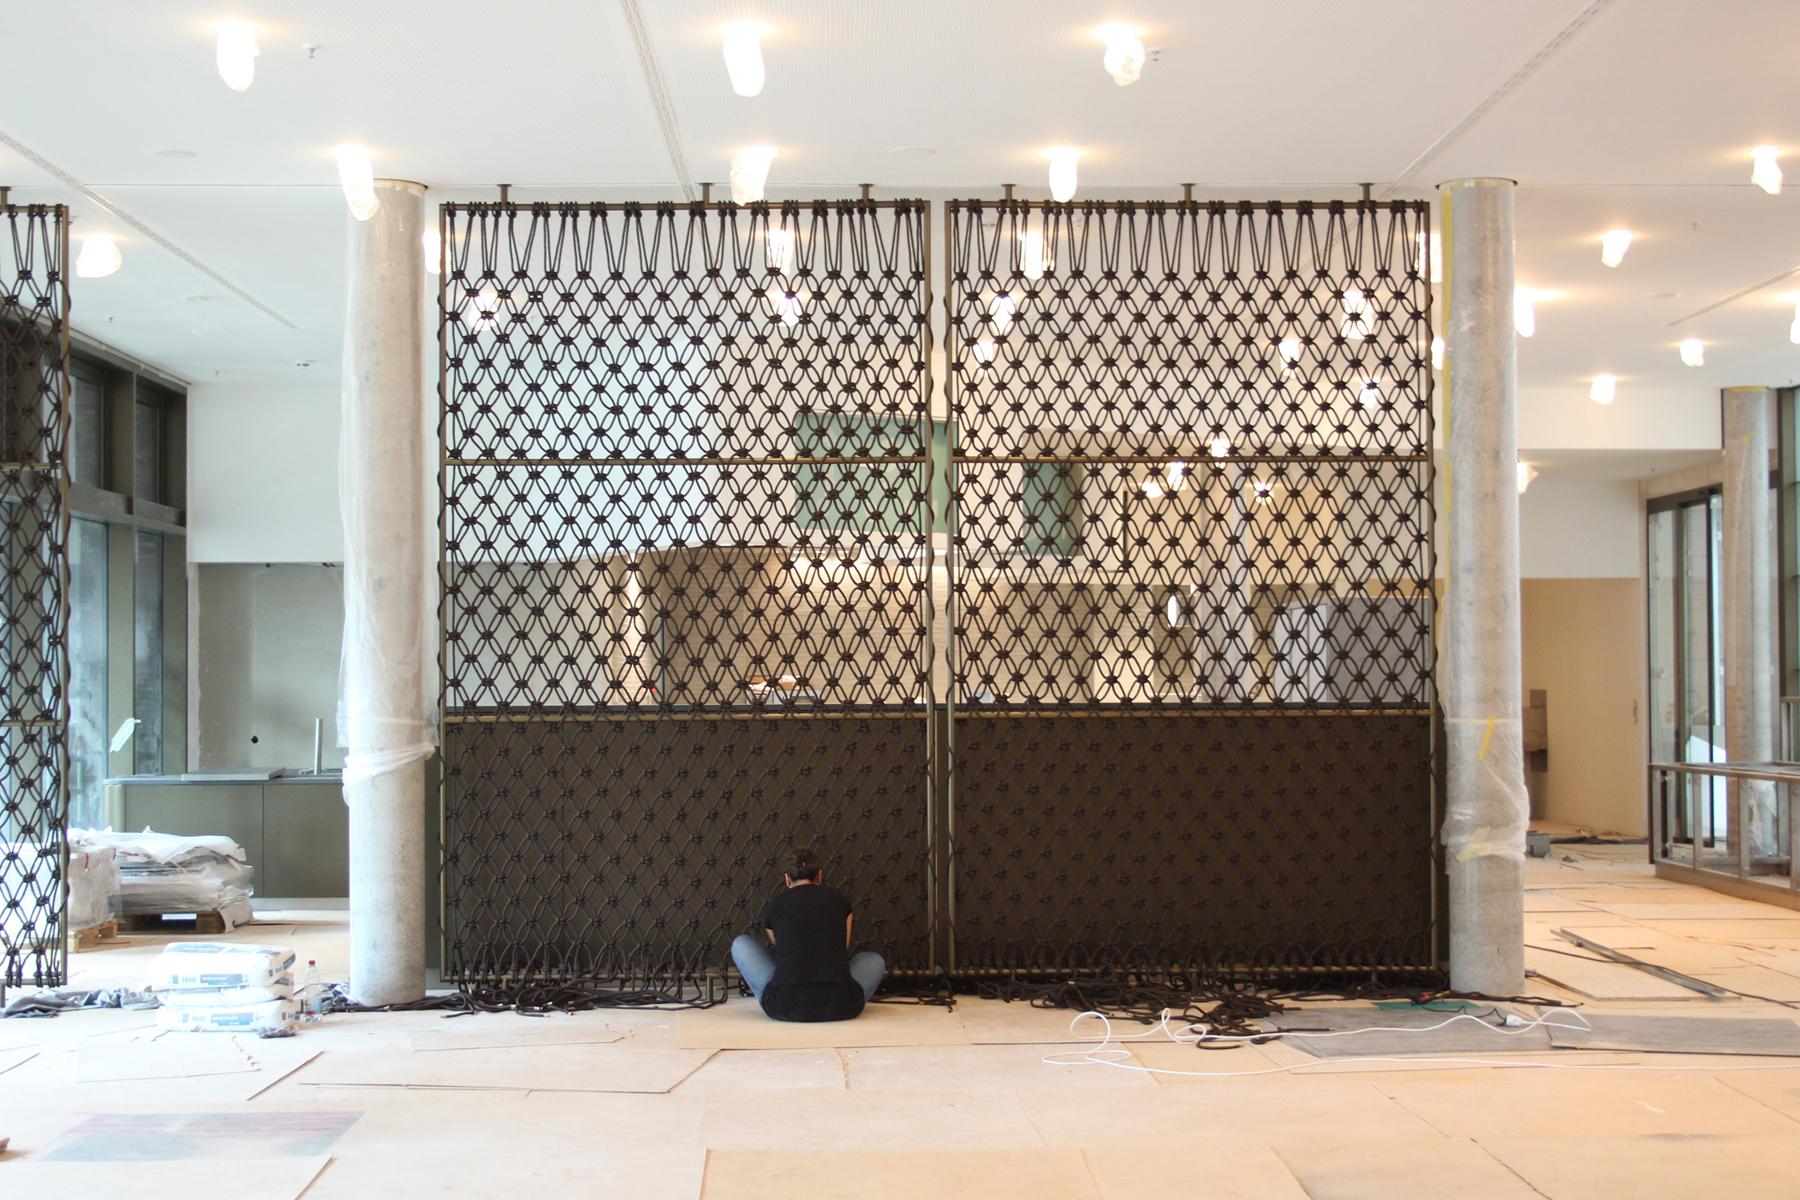 Christina-Pauls-Makrame-Raumteiler-Sichtschutz-Aufbau